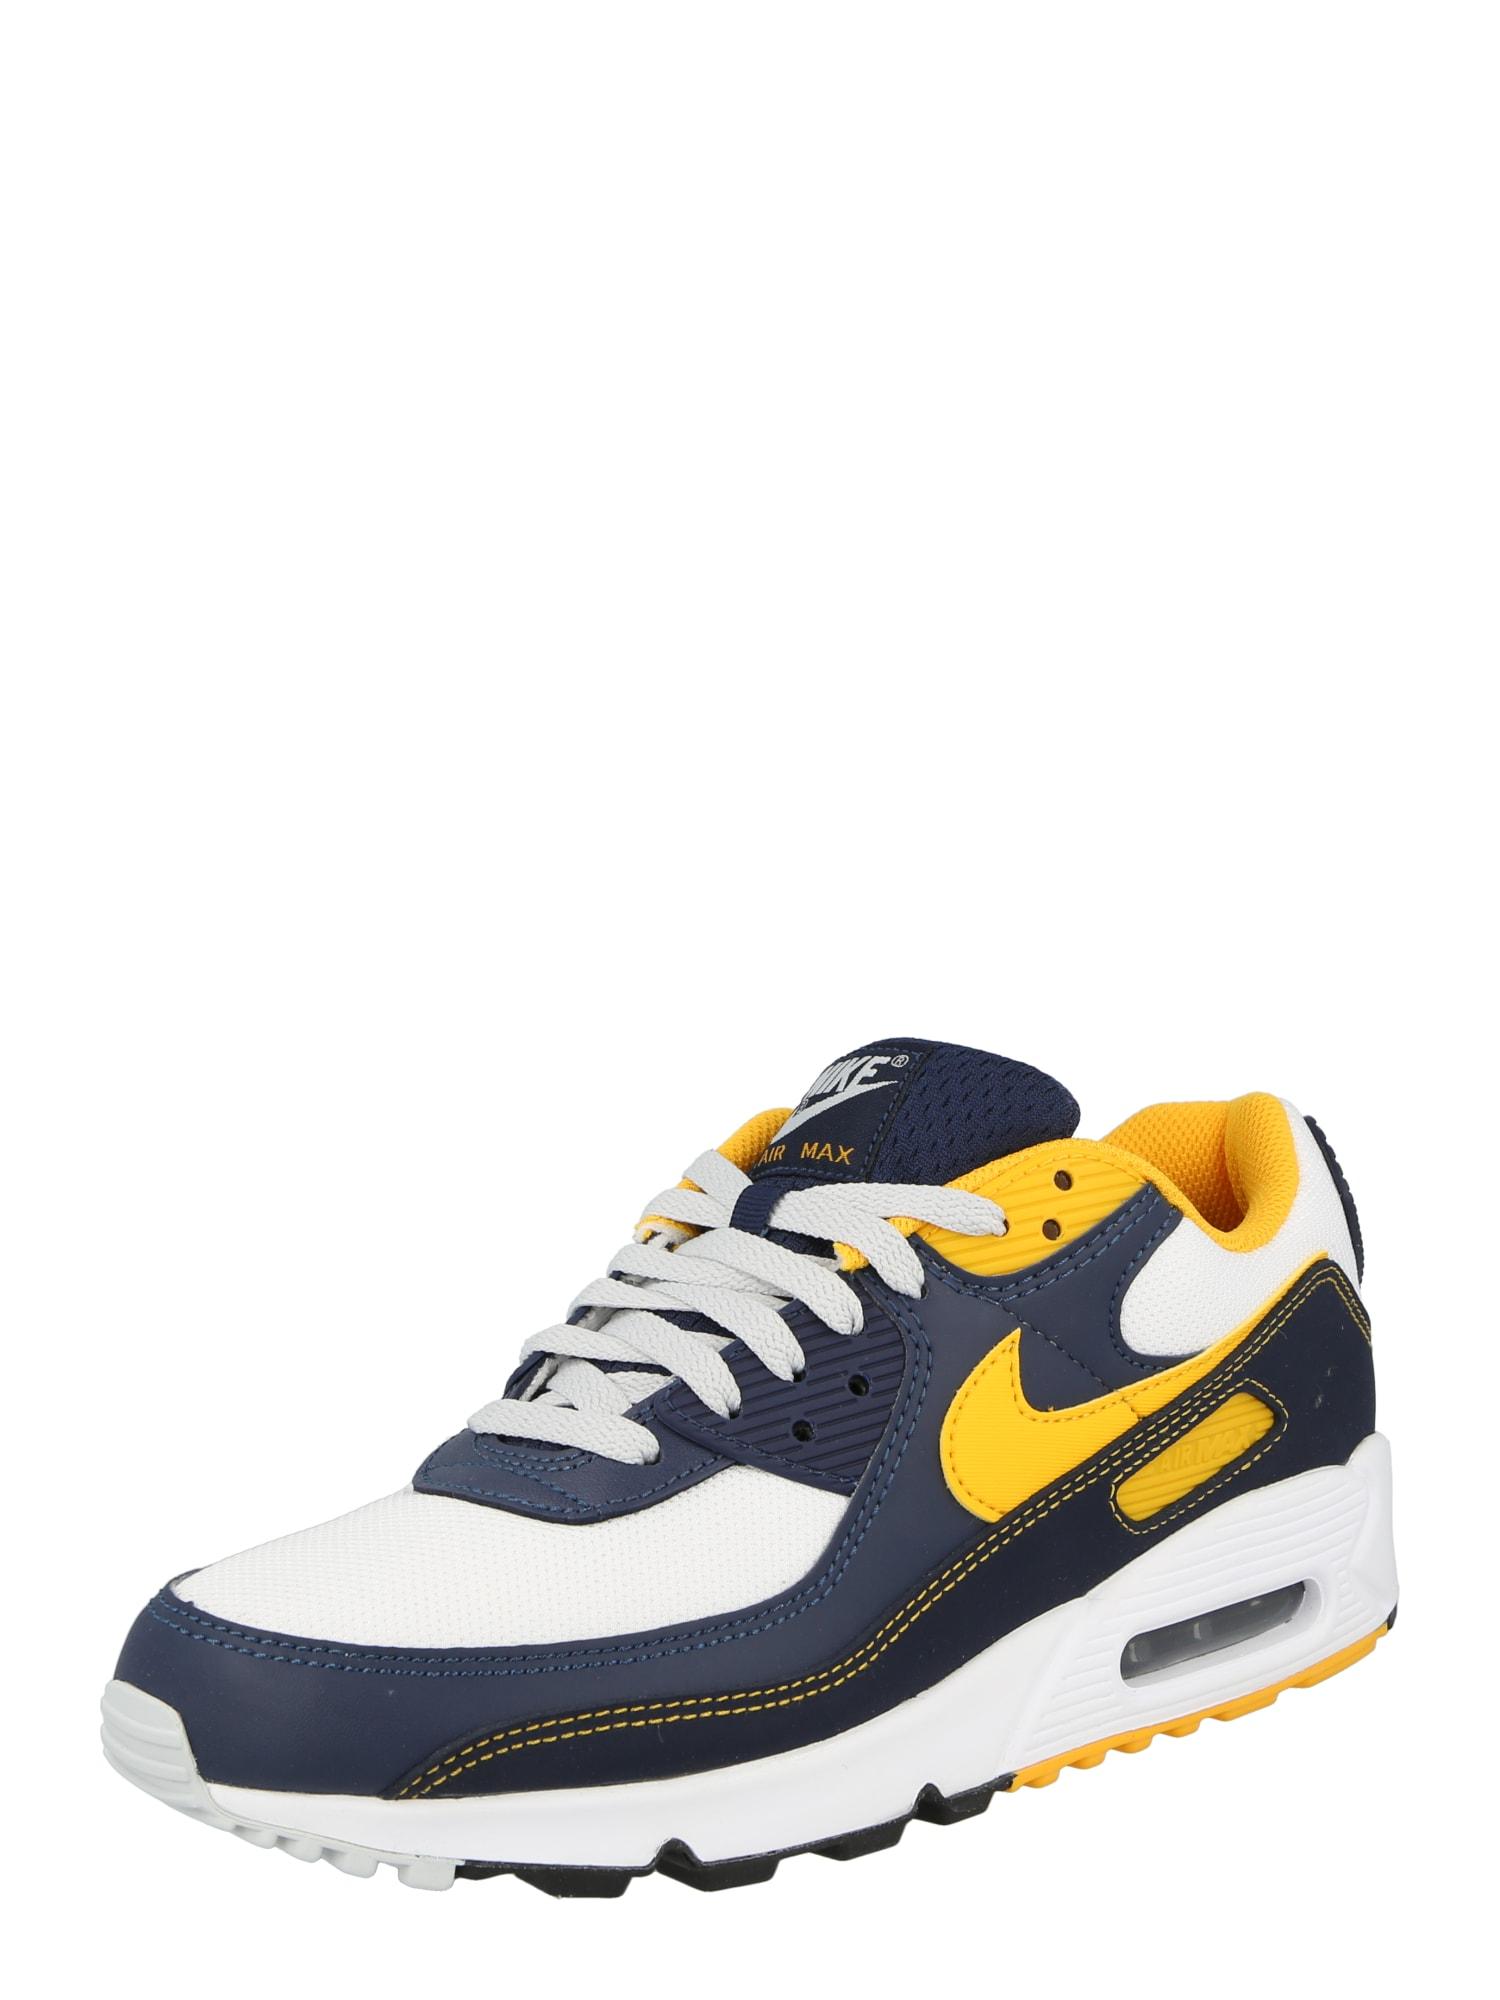 Nike Sportswear Nízke tenisky 'Air Max 90'  biela / tmavomodrá / zlatá žltá